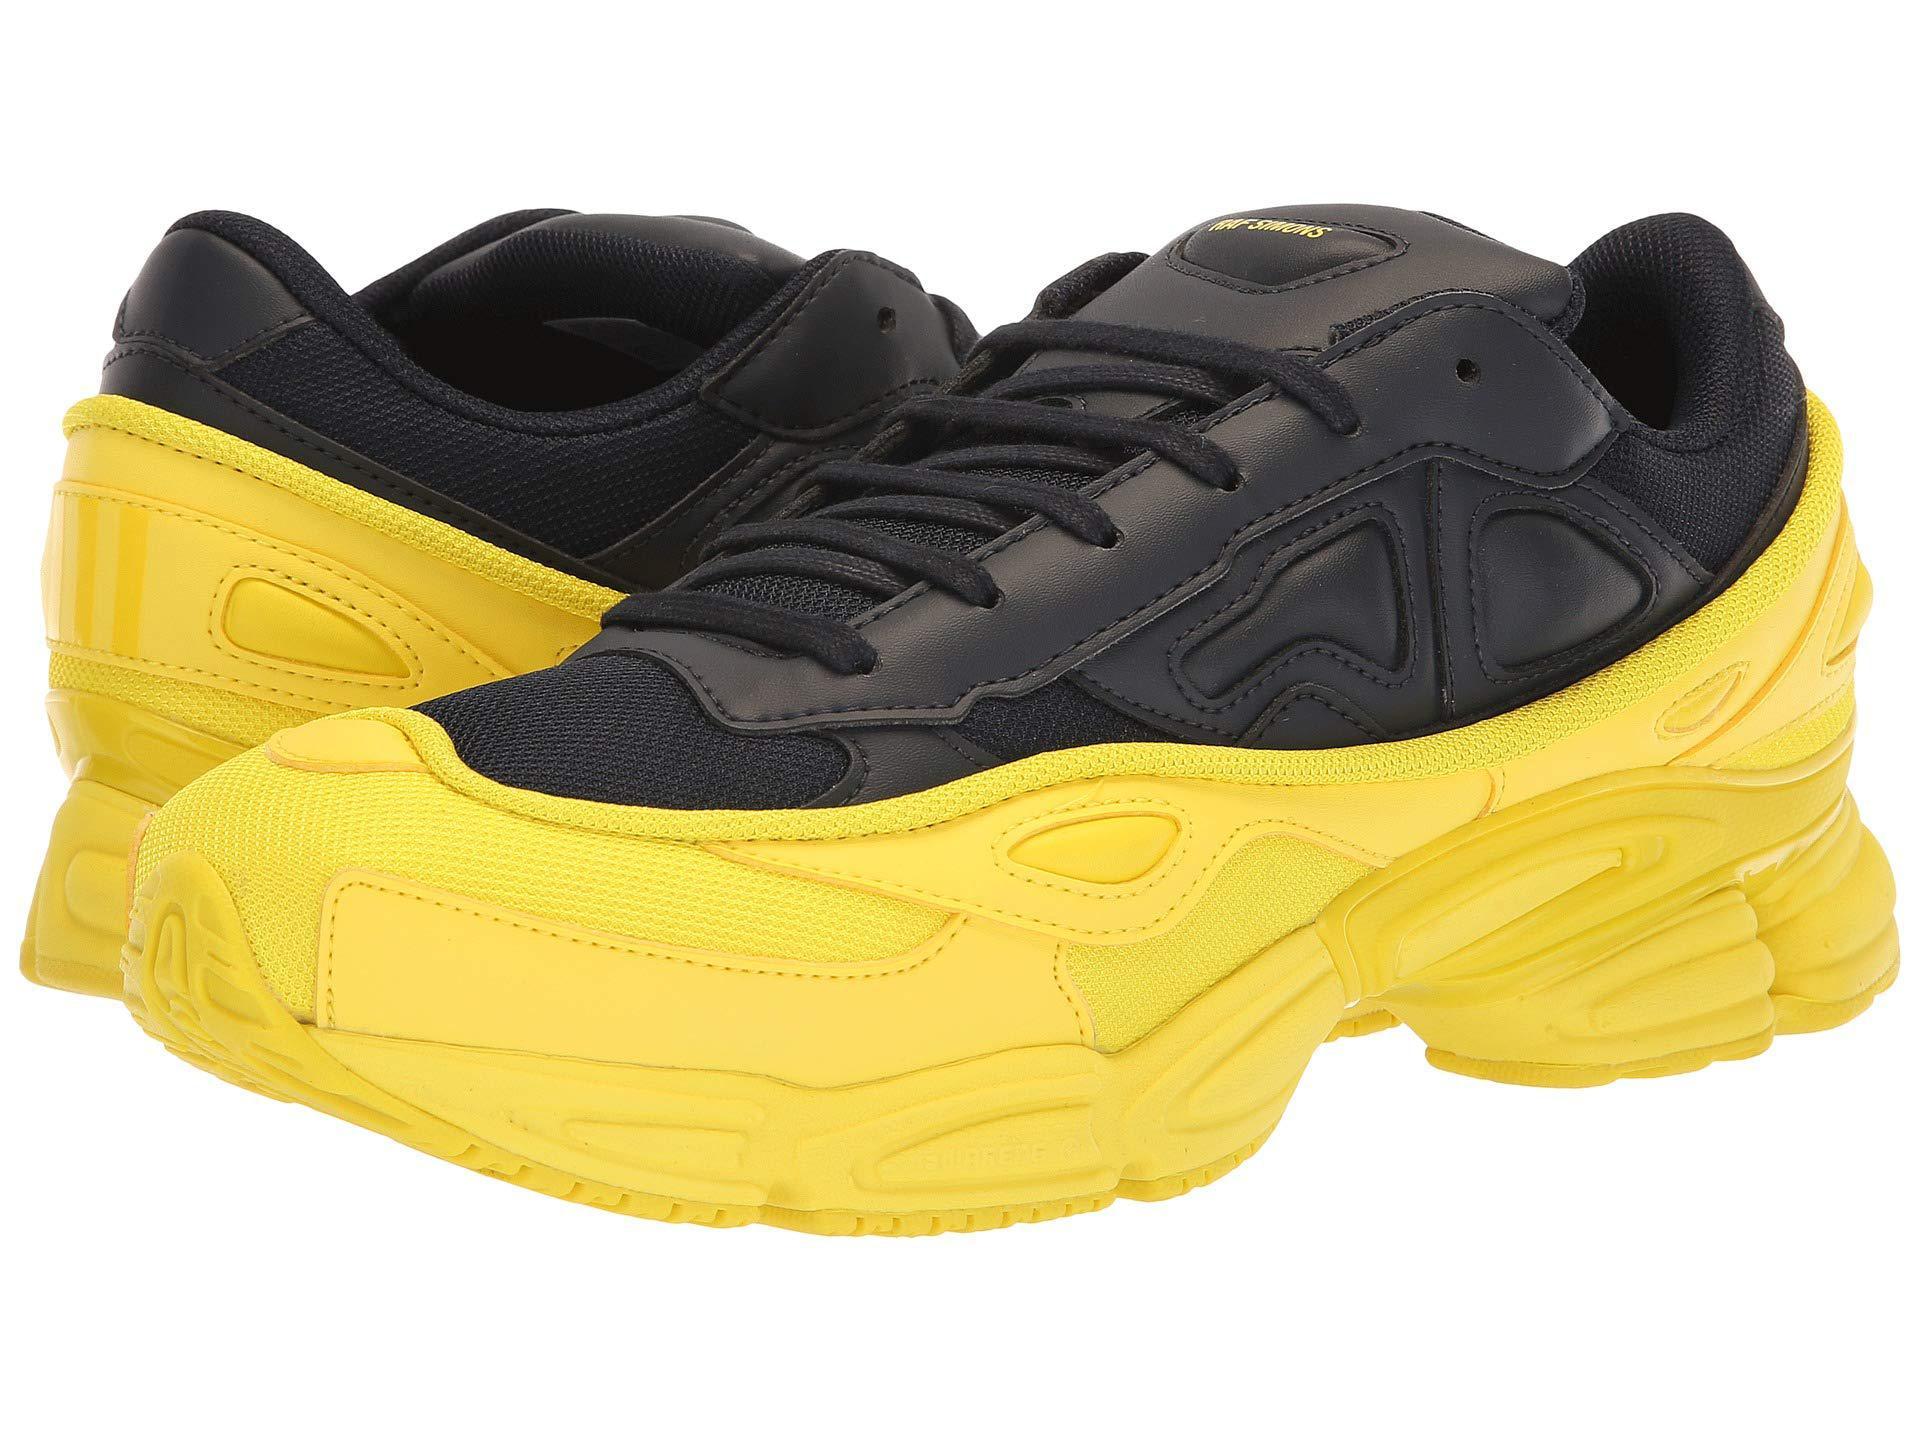 reputable site 4c07e 19fdf ... buying now Lyst - Adidas By Raf Simons Raf Simons Ozweego (cream White  core . ...